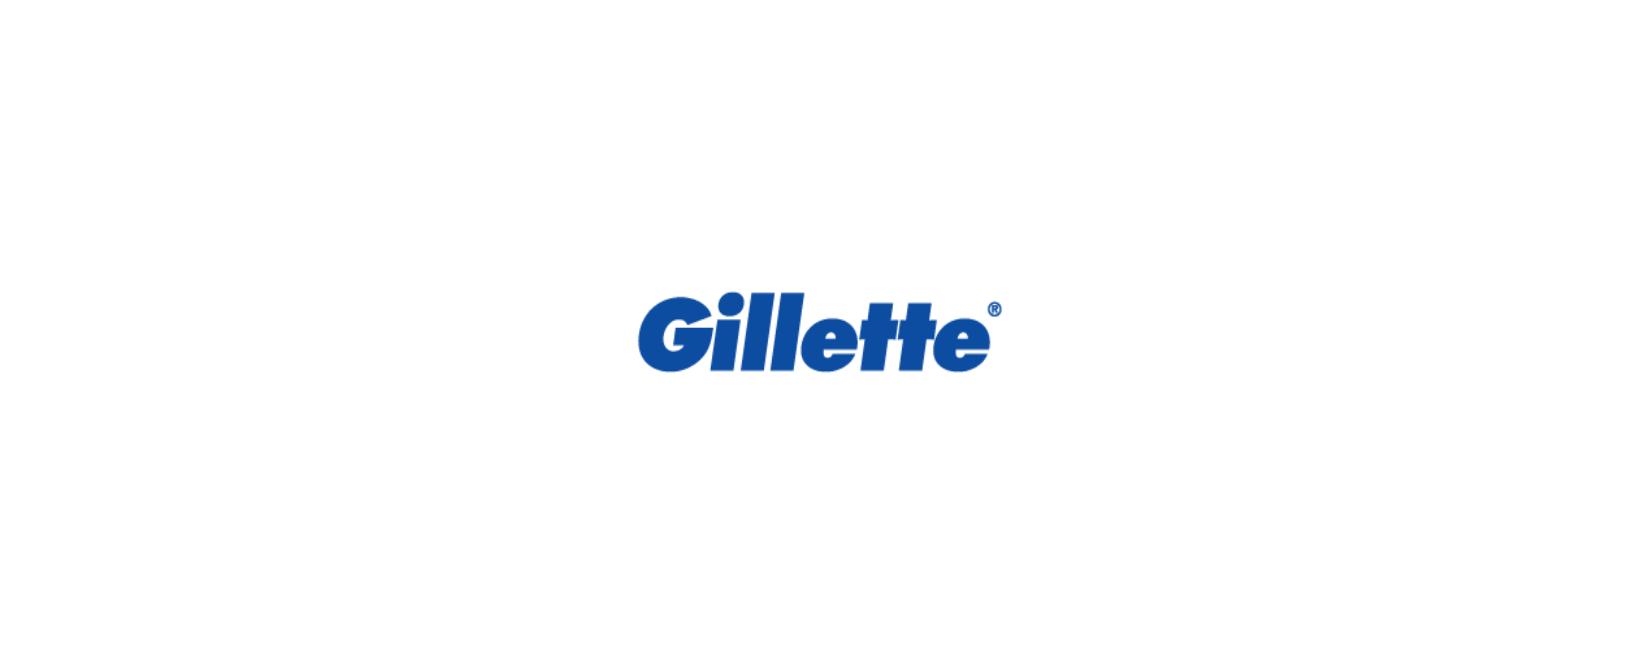 Gillette Discount Code 2021